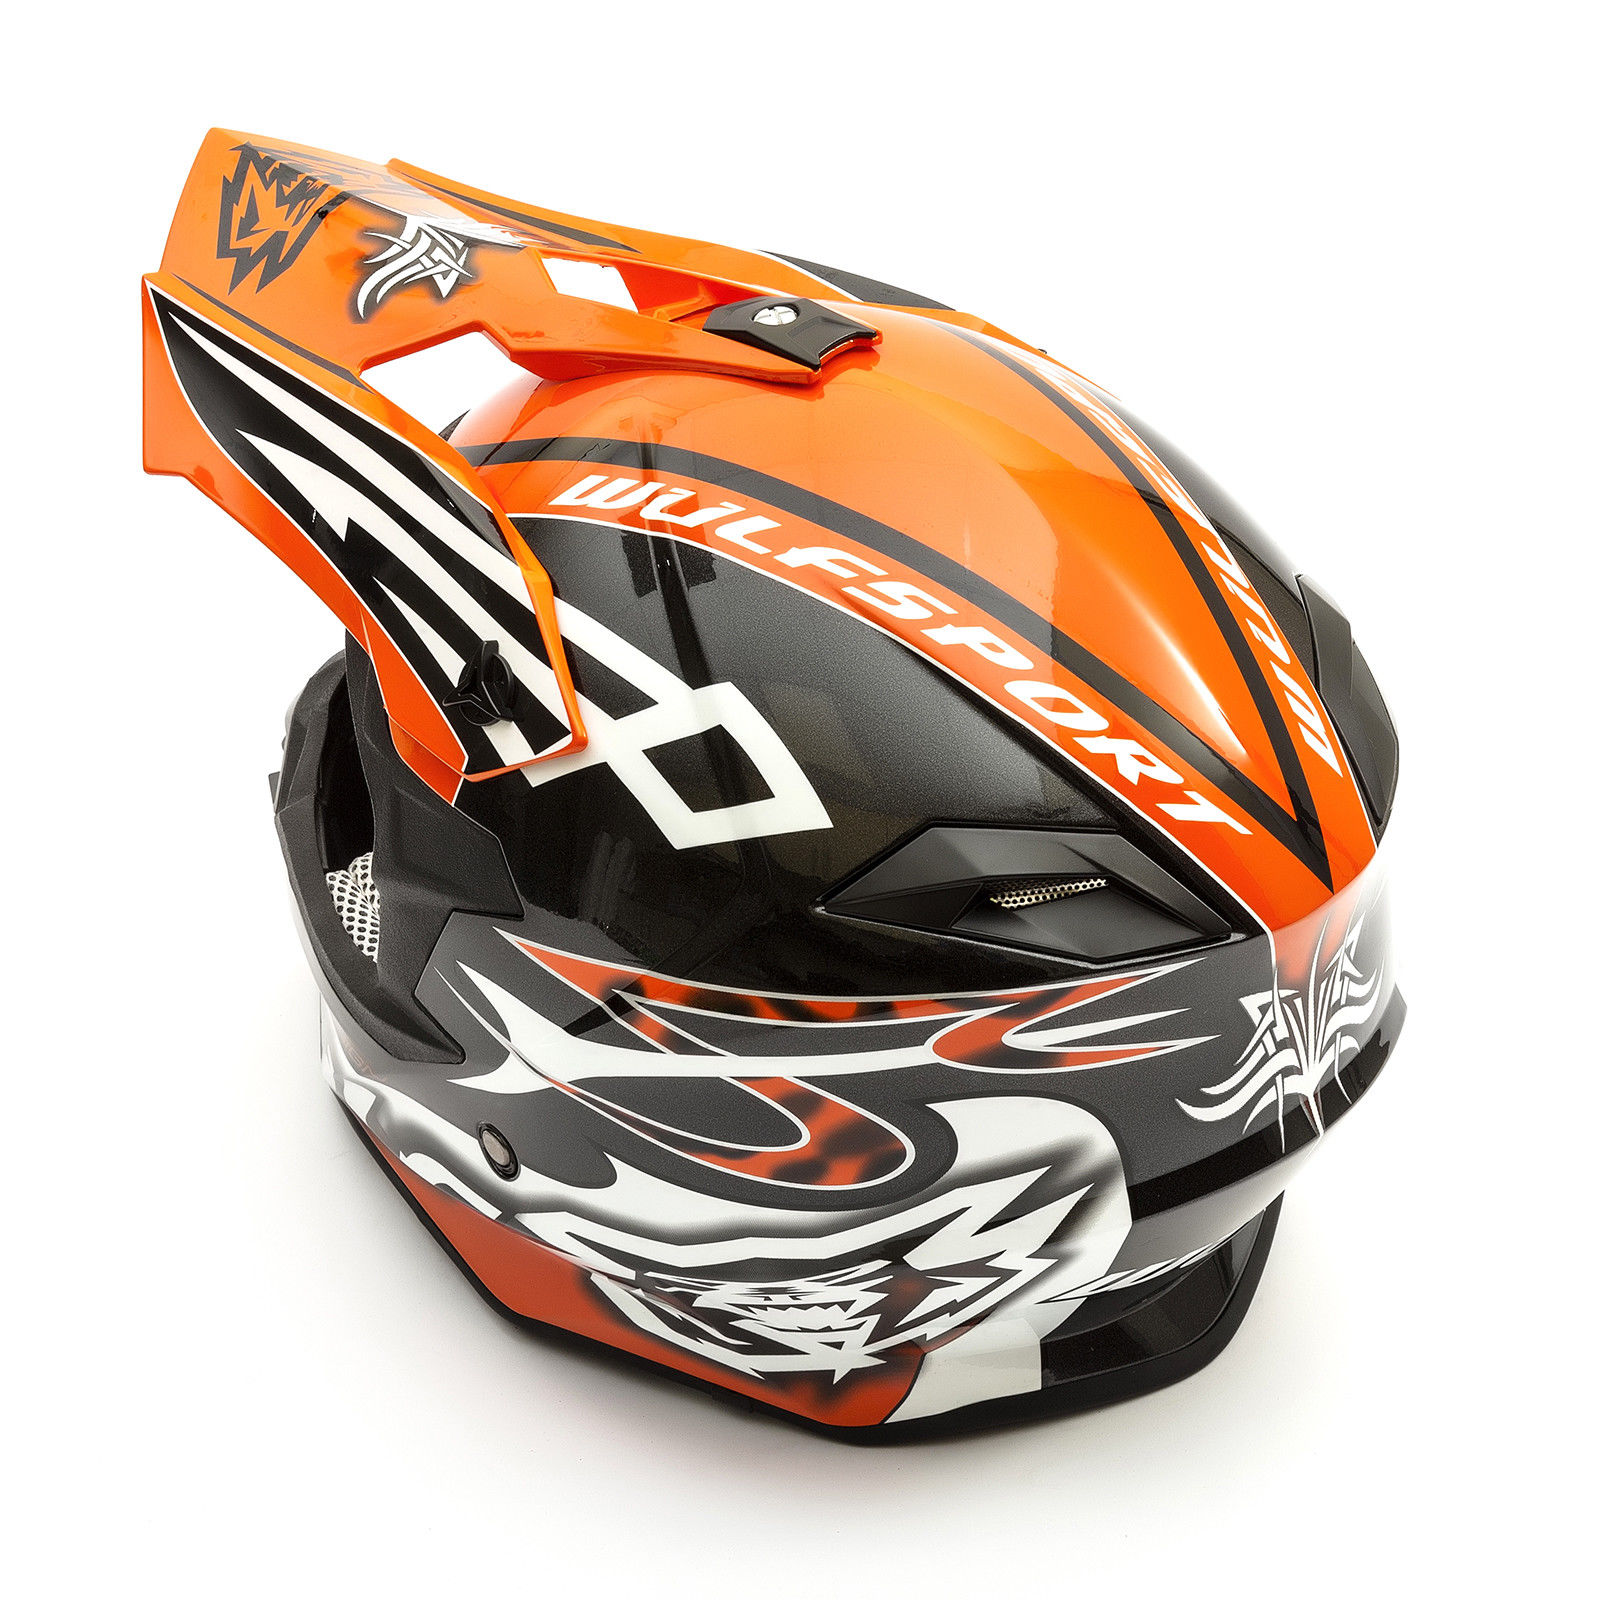 Wulfsport-Adult-Sceptre-Helmets-Motocross-Pitbike-Motorbike-Off-Road-Racing-ATV thumbnail 77